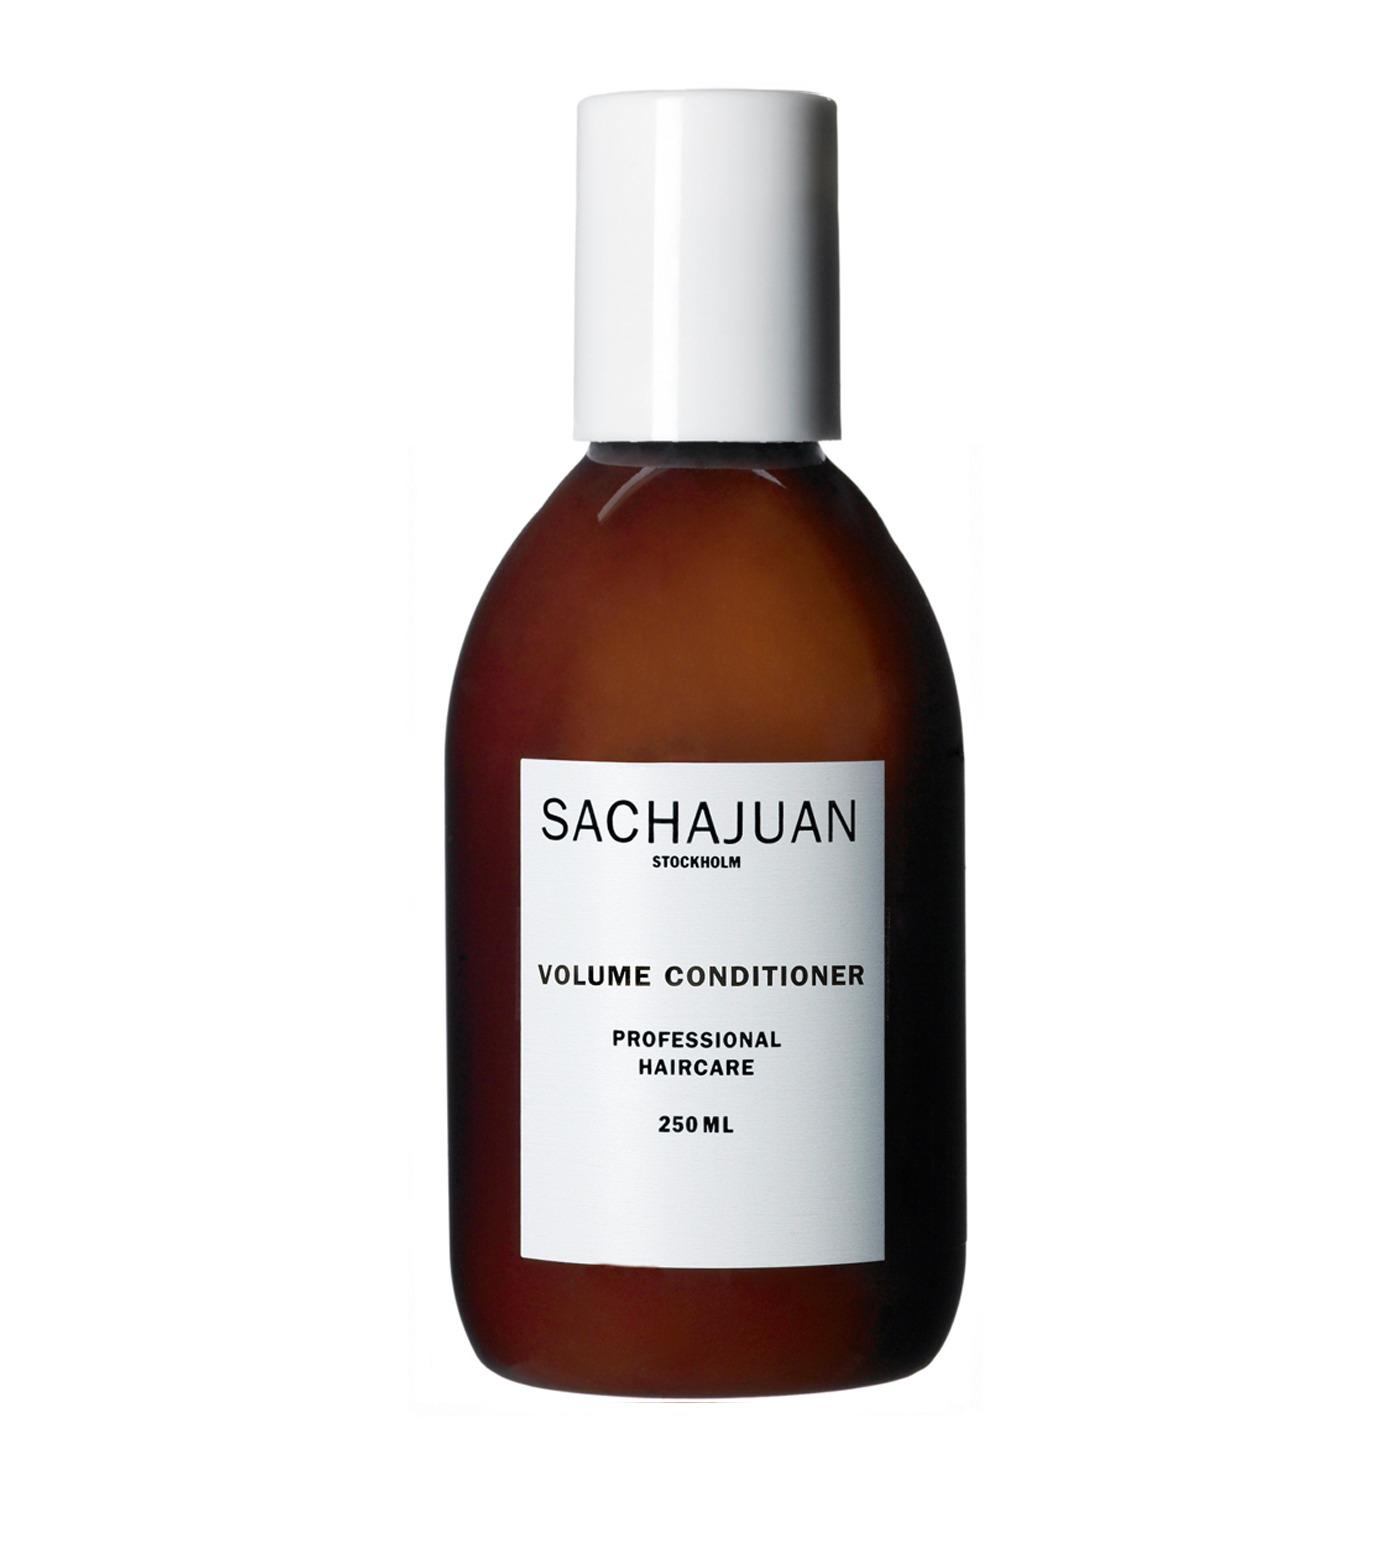 SACHAJUAN(サシャワン)のVolume Conditioner 250ml-WHITE(HAIR-CARE/HAIR-CARE)-124-4 拡大詳細画像1